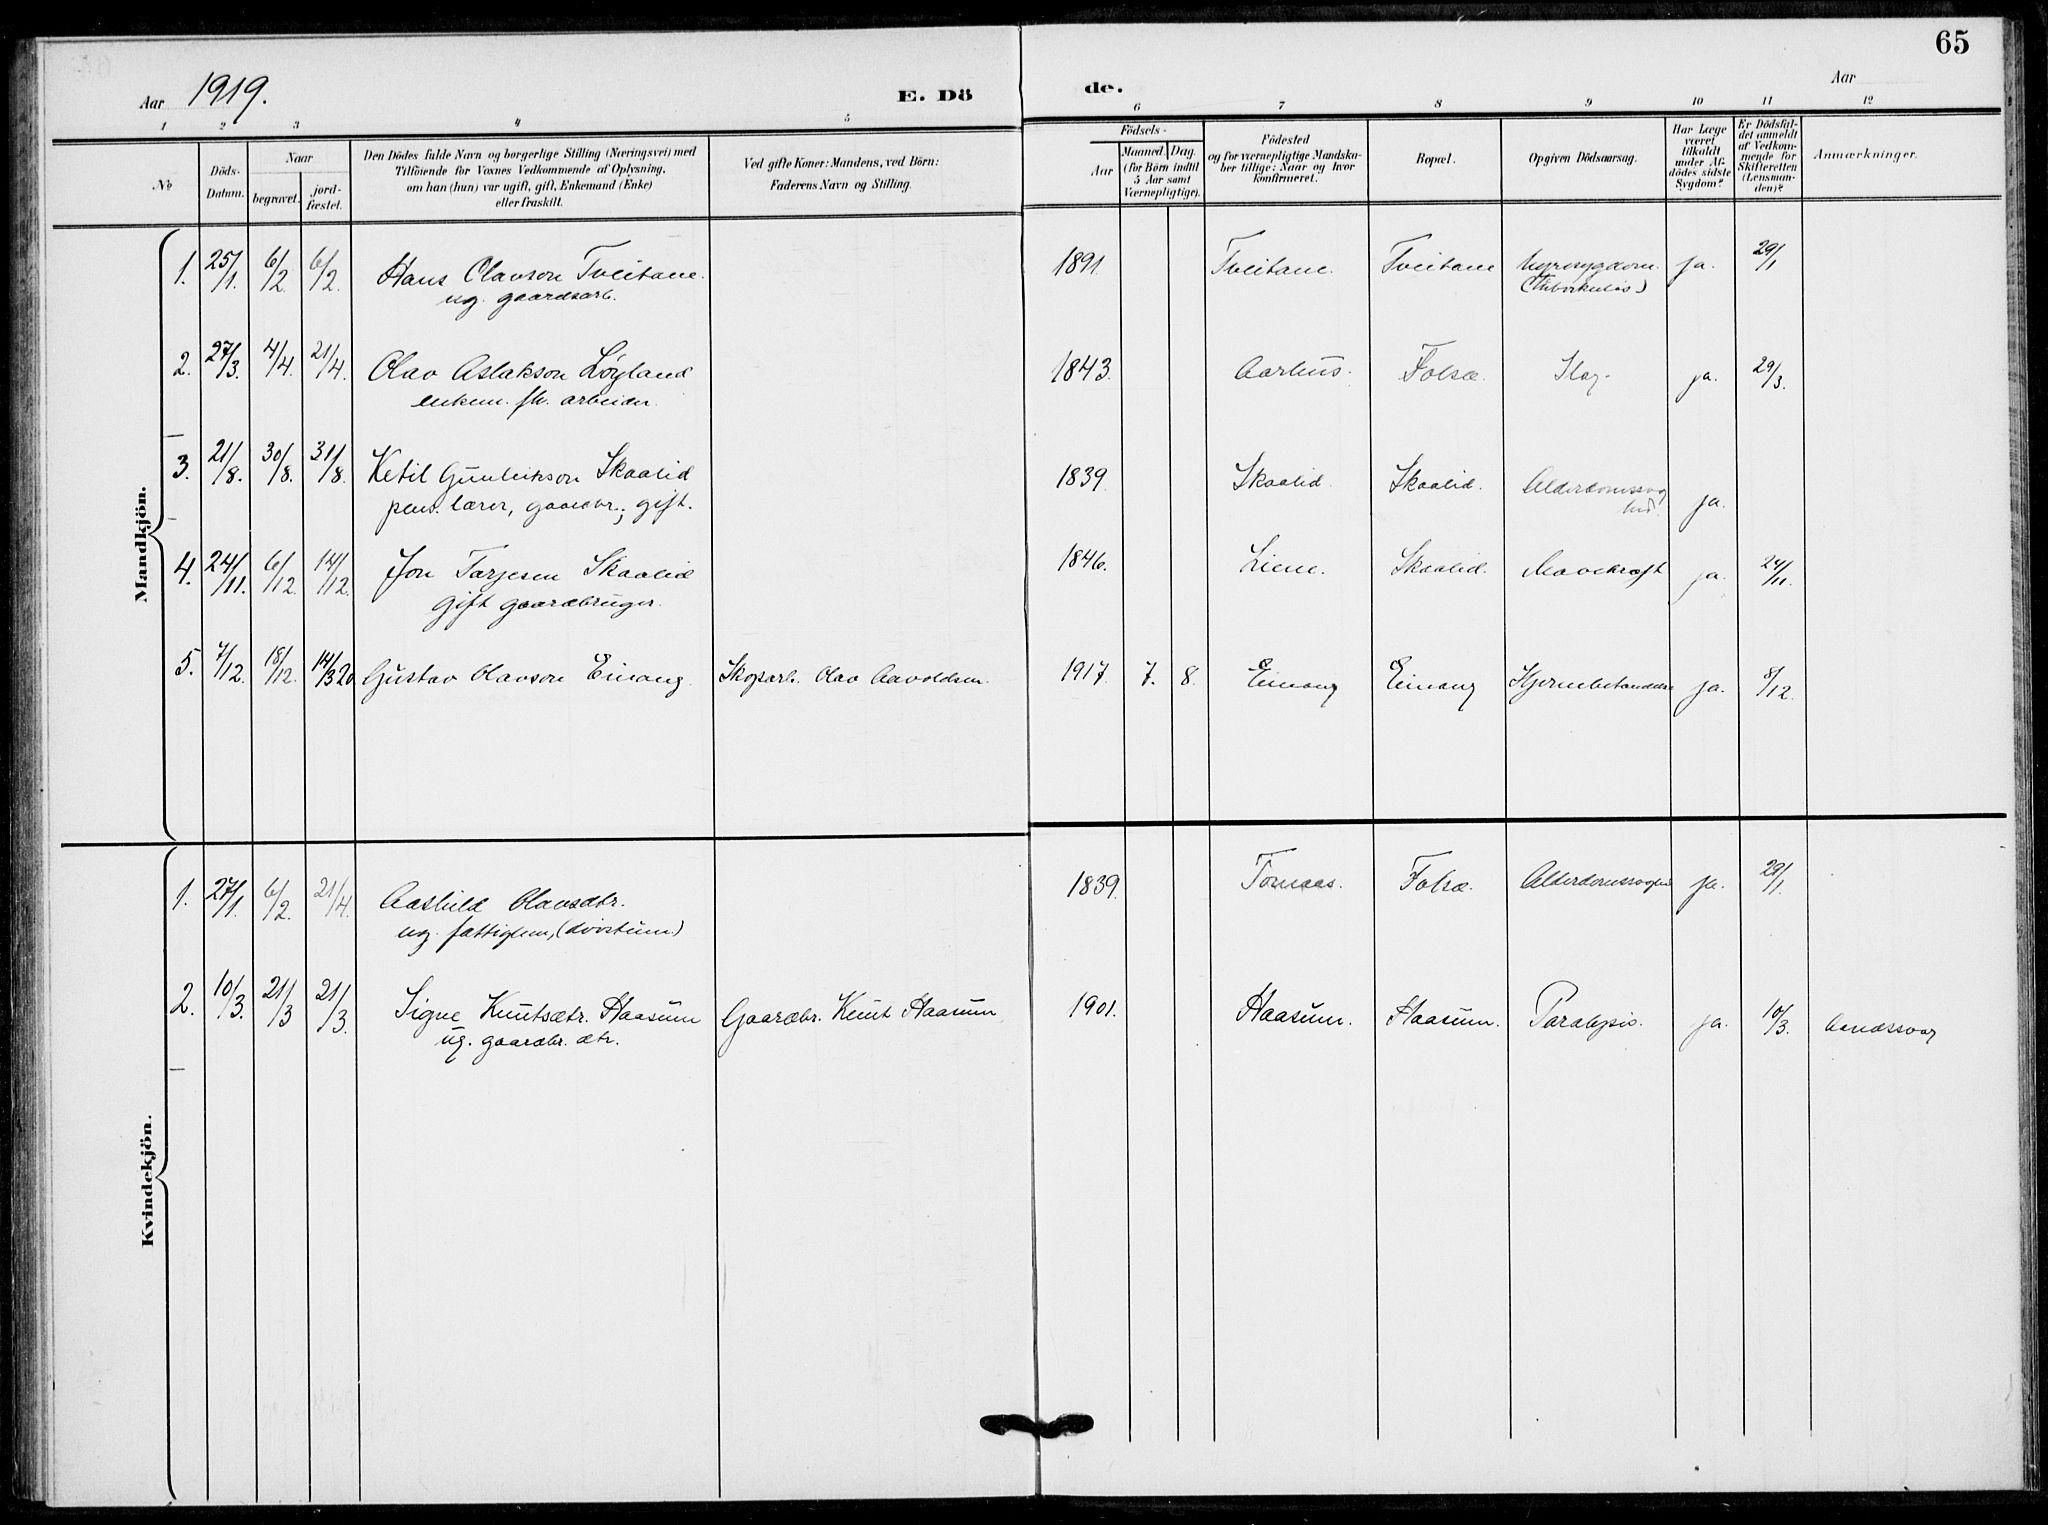 SAKO, Fyresdal kirkebøker, F/Fb/L0004: Ministerialbok nr. II 4, 1903-1920, s. 65